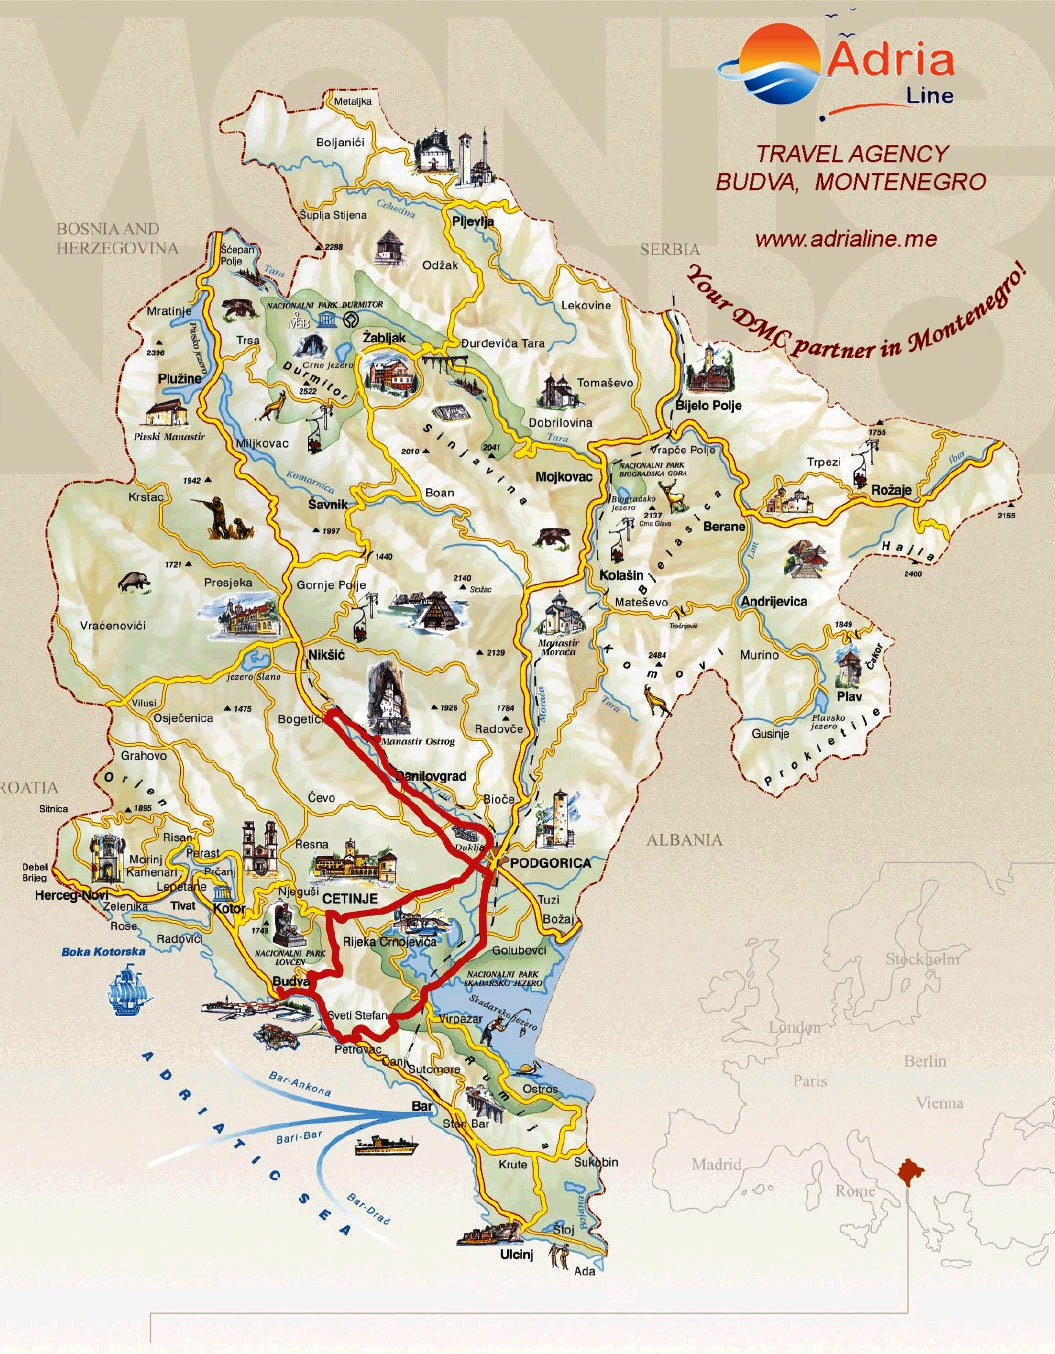 mapa crne gore manastir ostrog EXCURSION OSTROG MONASTERY   Montenegro Travel Agency Adria Line mapa crne gore manastir ostrog